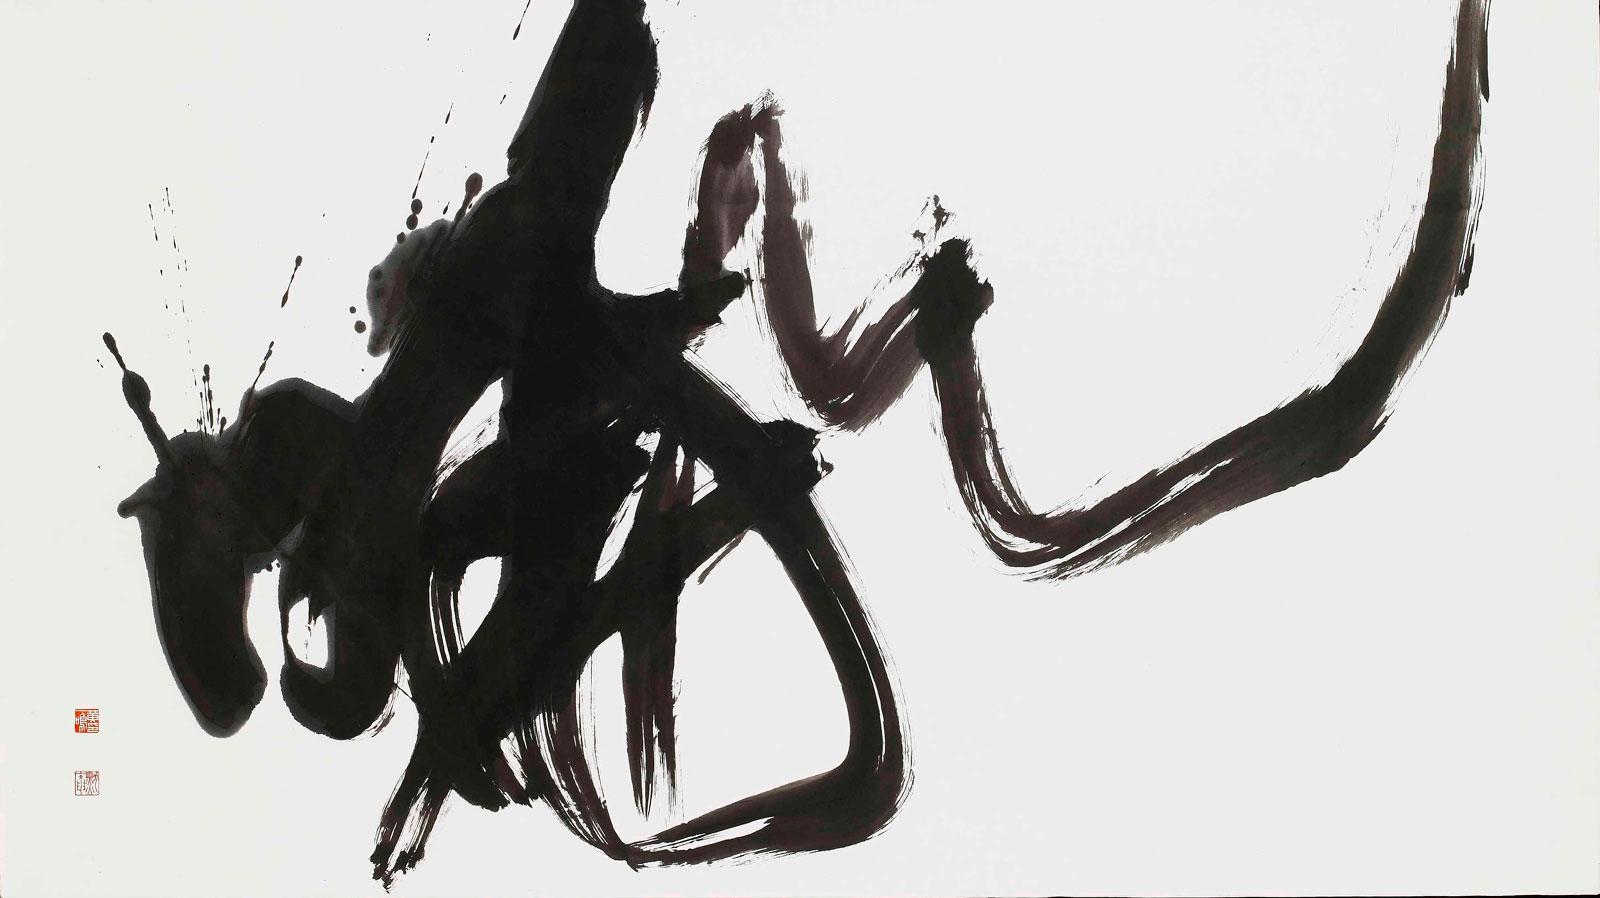 2009, cursive script, ink on xuan paper, 24.75 x 35.5 inches